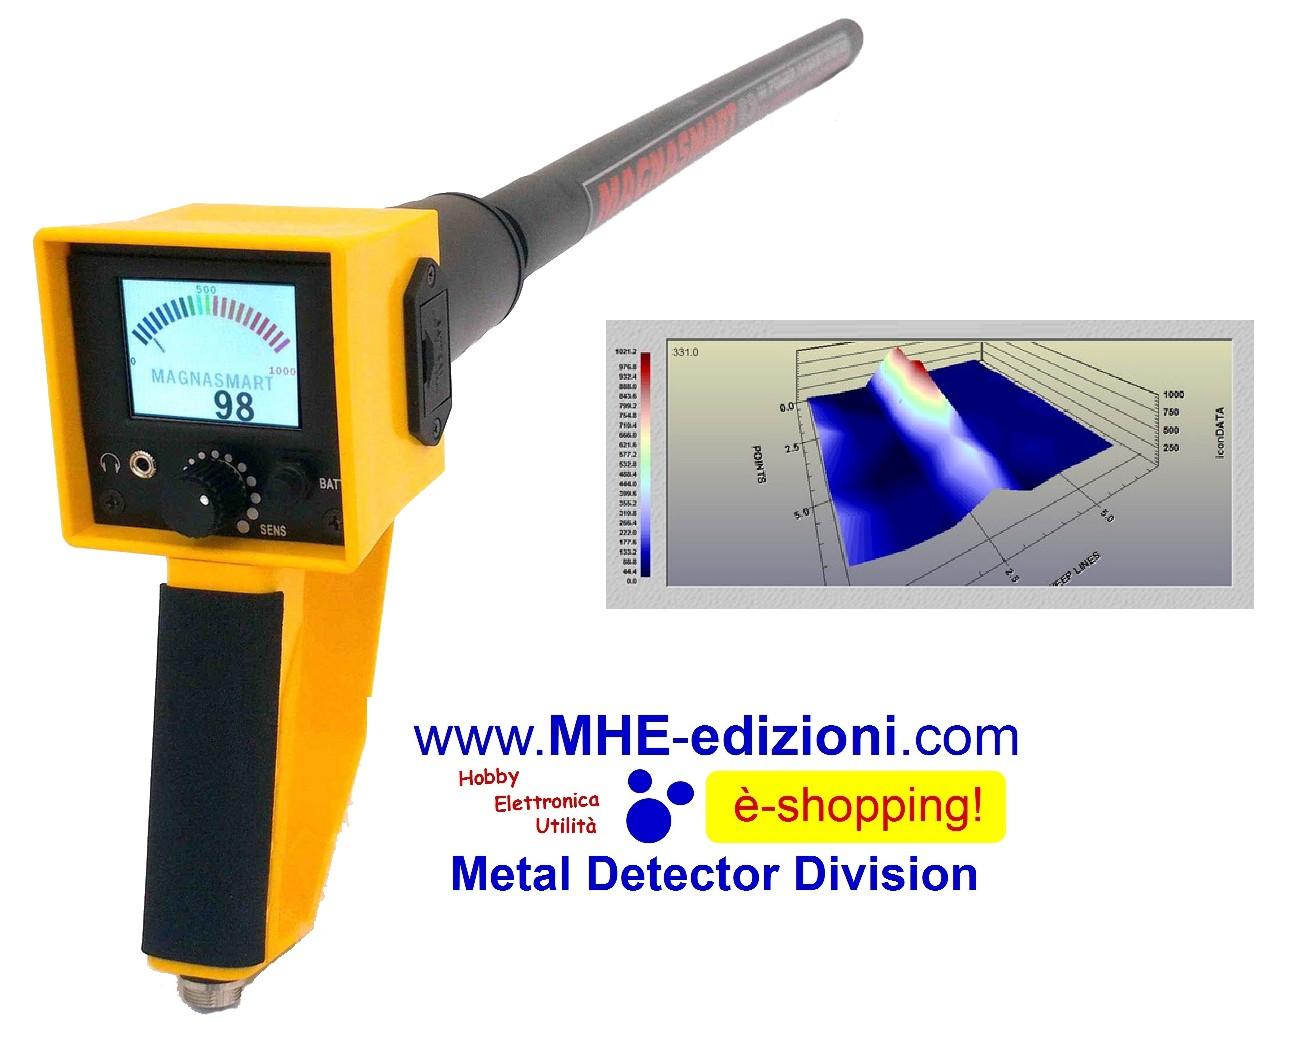 Metal Locators Output Circuit Of Pi Detector Longrangelocators Forums Magnasmart Magnetometer Image Mhe Edizioni 1298x1040